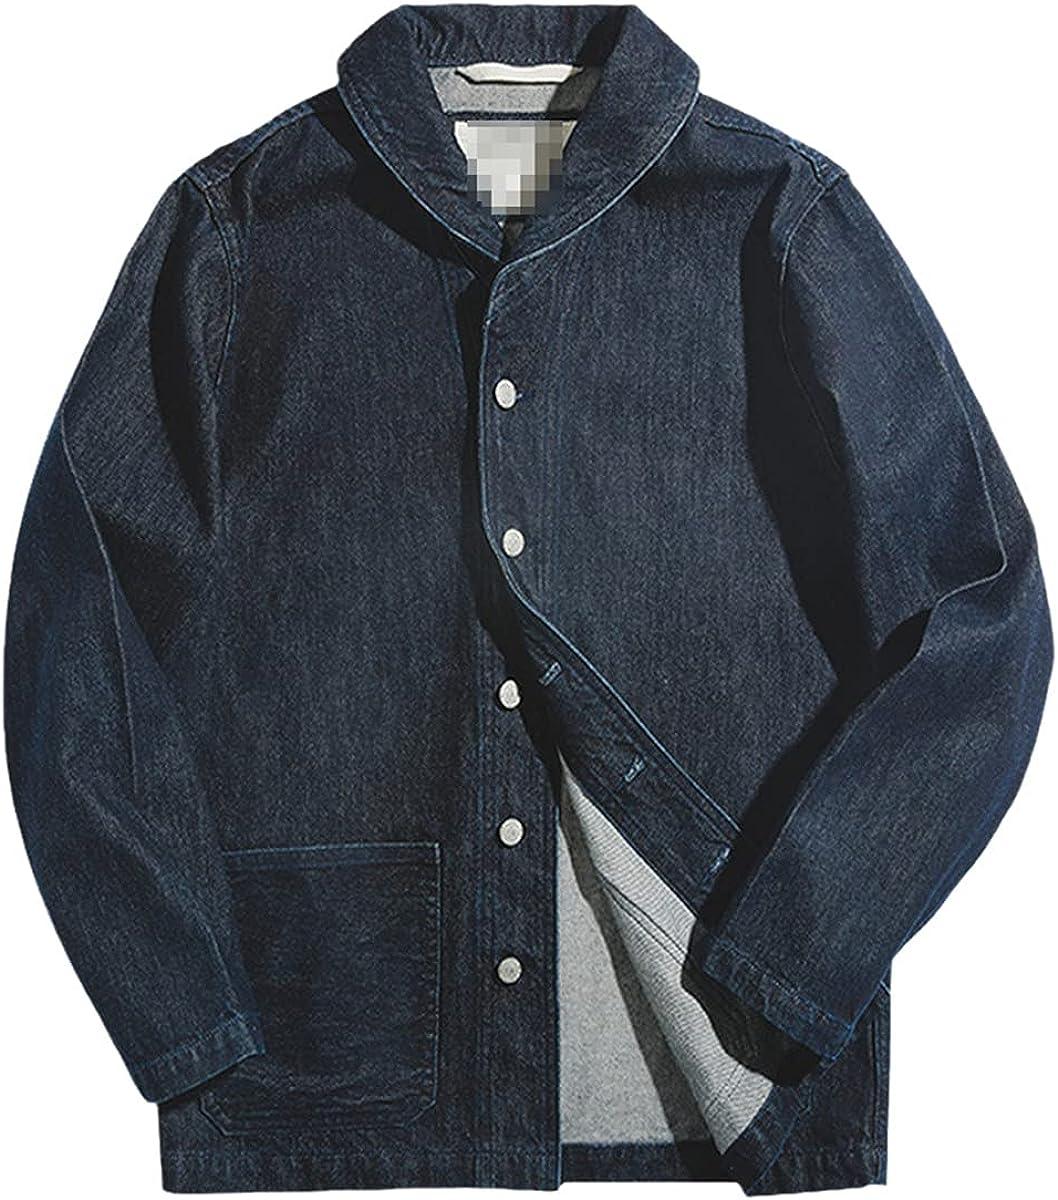 DFLYHLH Washed Denim Jacket Men's Retro Overalls Suit Jacket Cotton Solid Color Hunting Denim Lapel Jacket